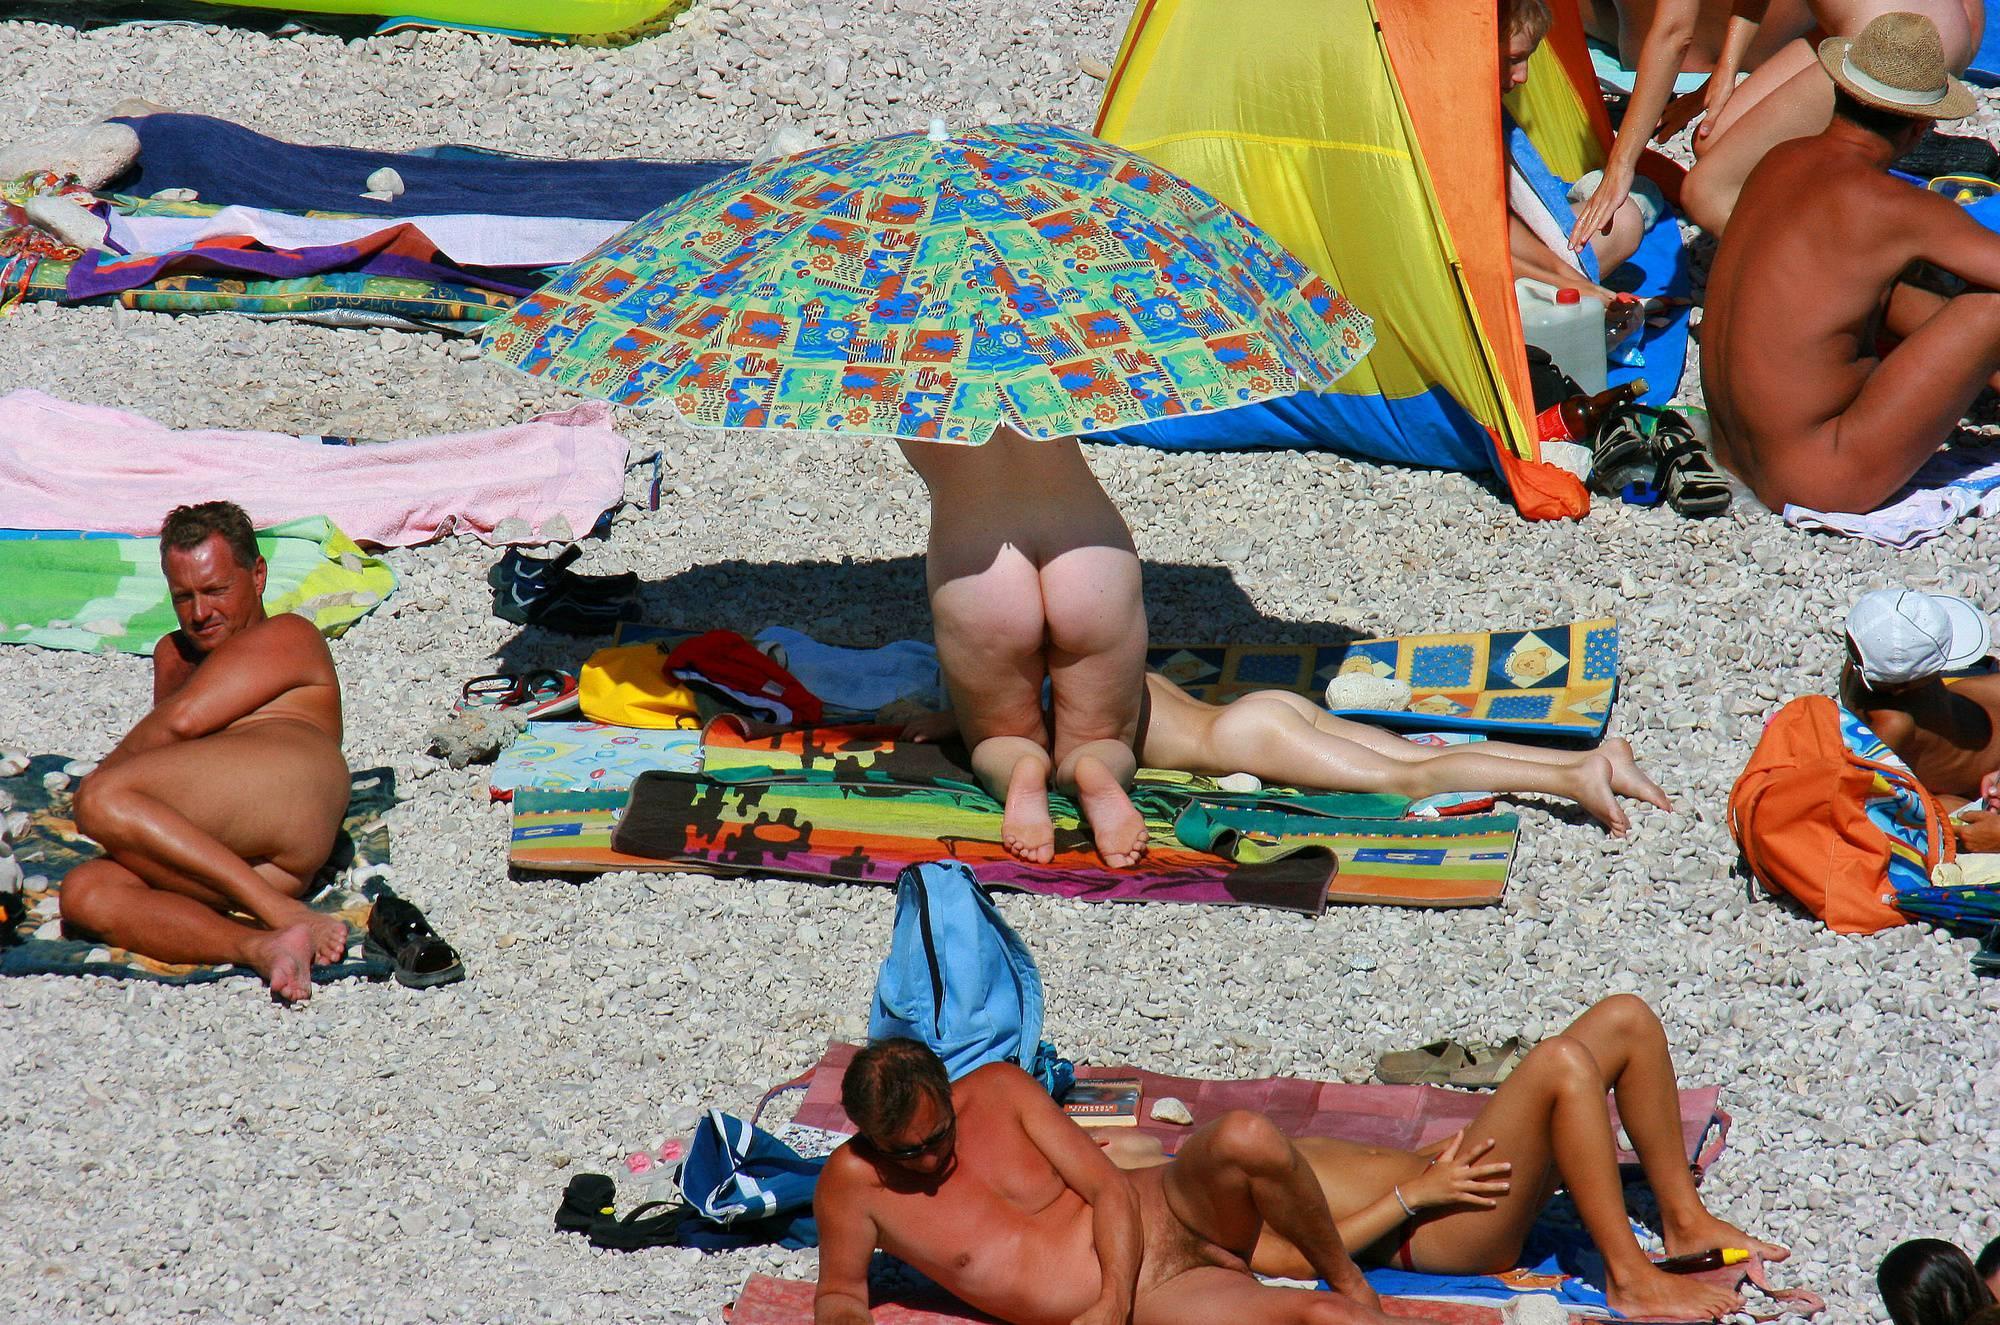 Pure Nudism Uka FKK Beach Parenting - 2